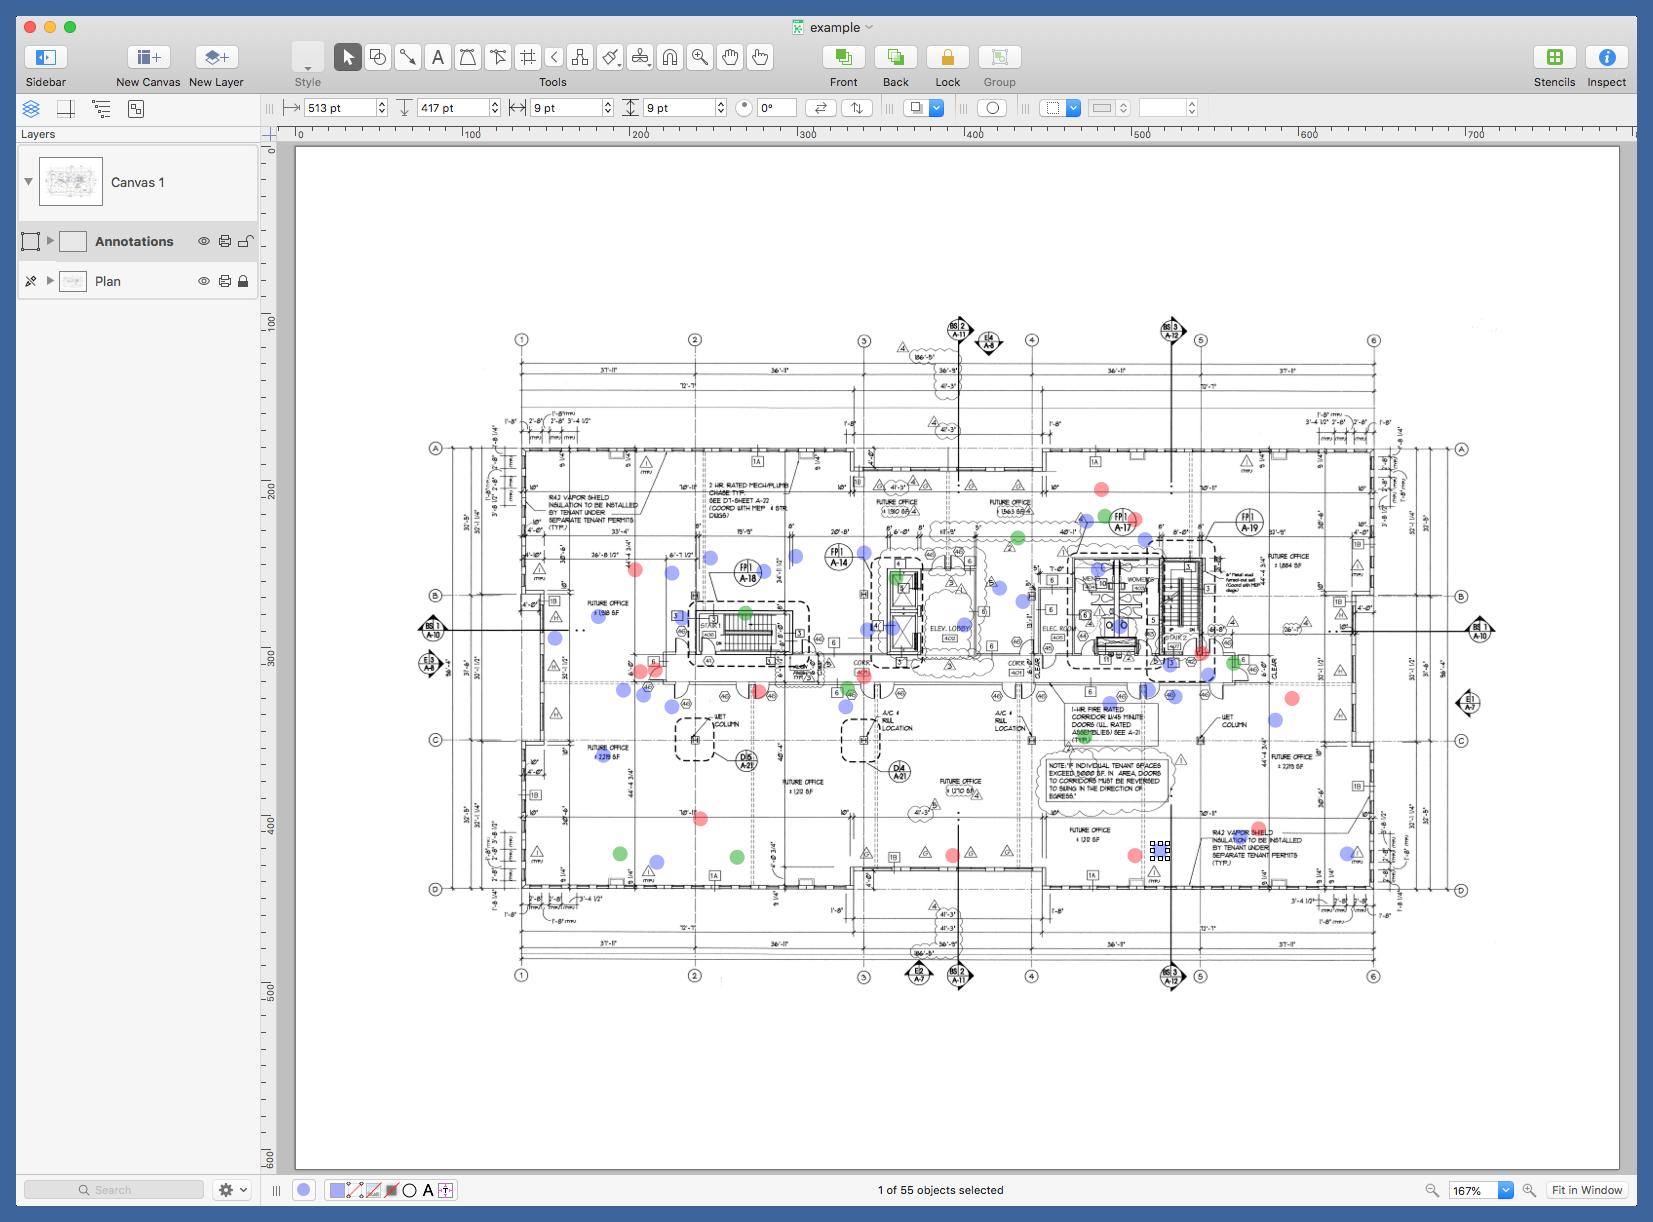 OmniGraffle annotated floor plan